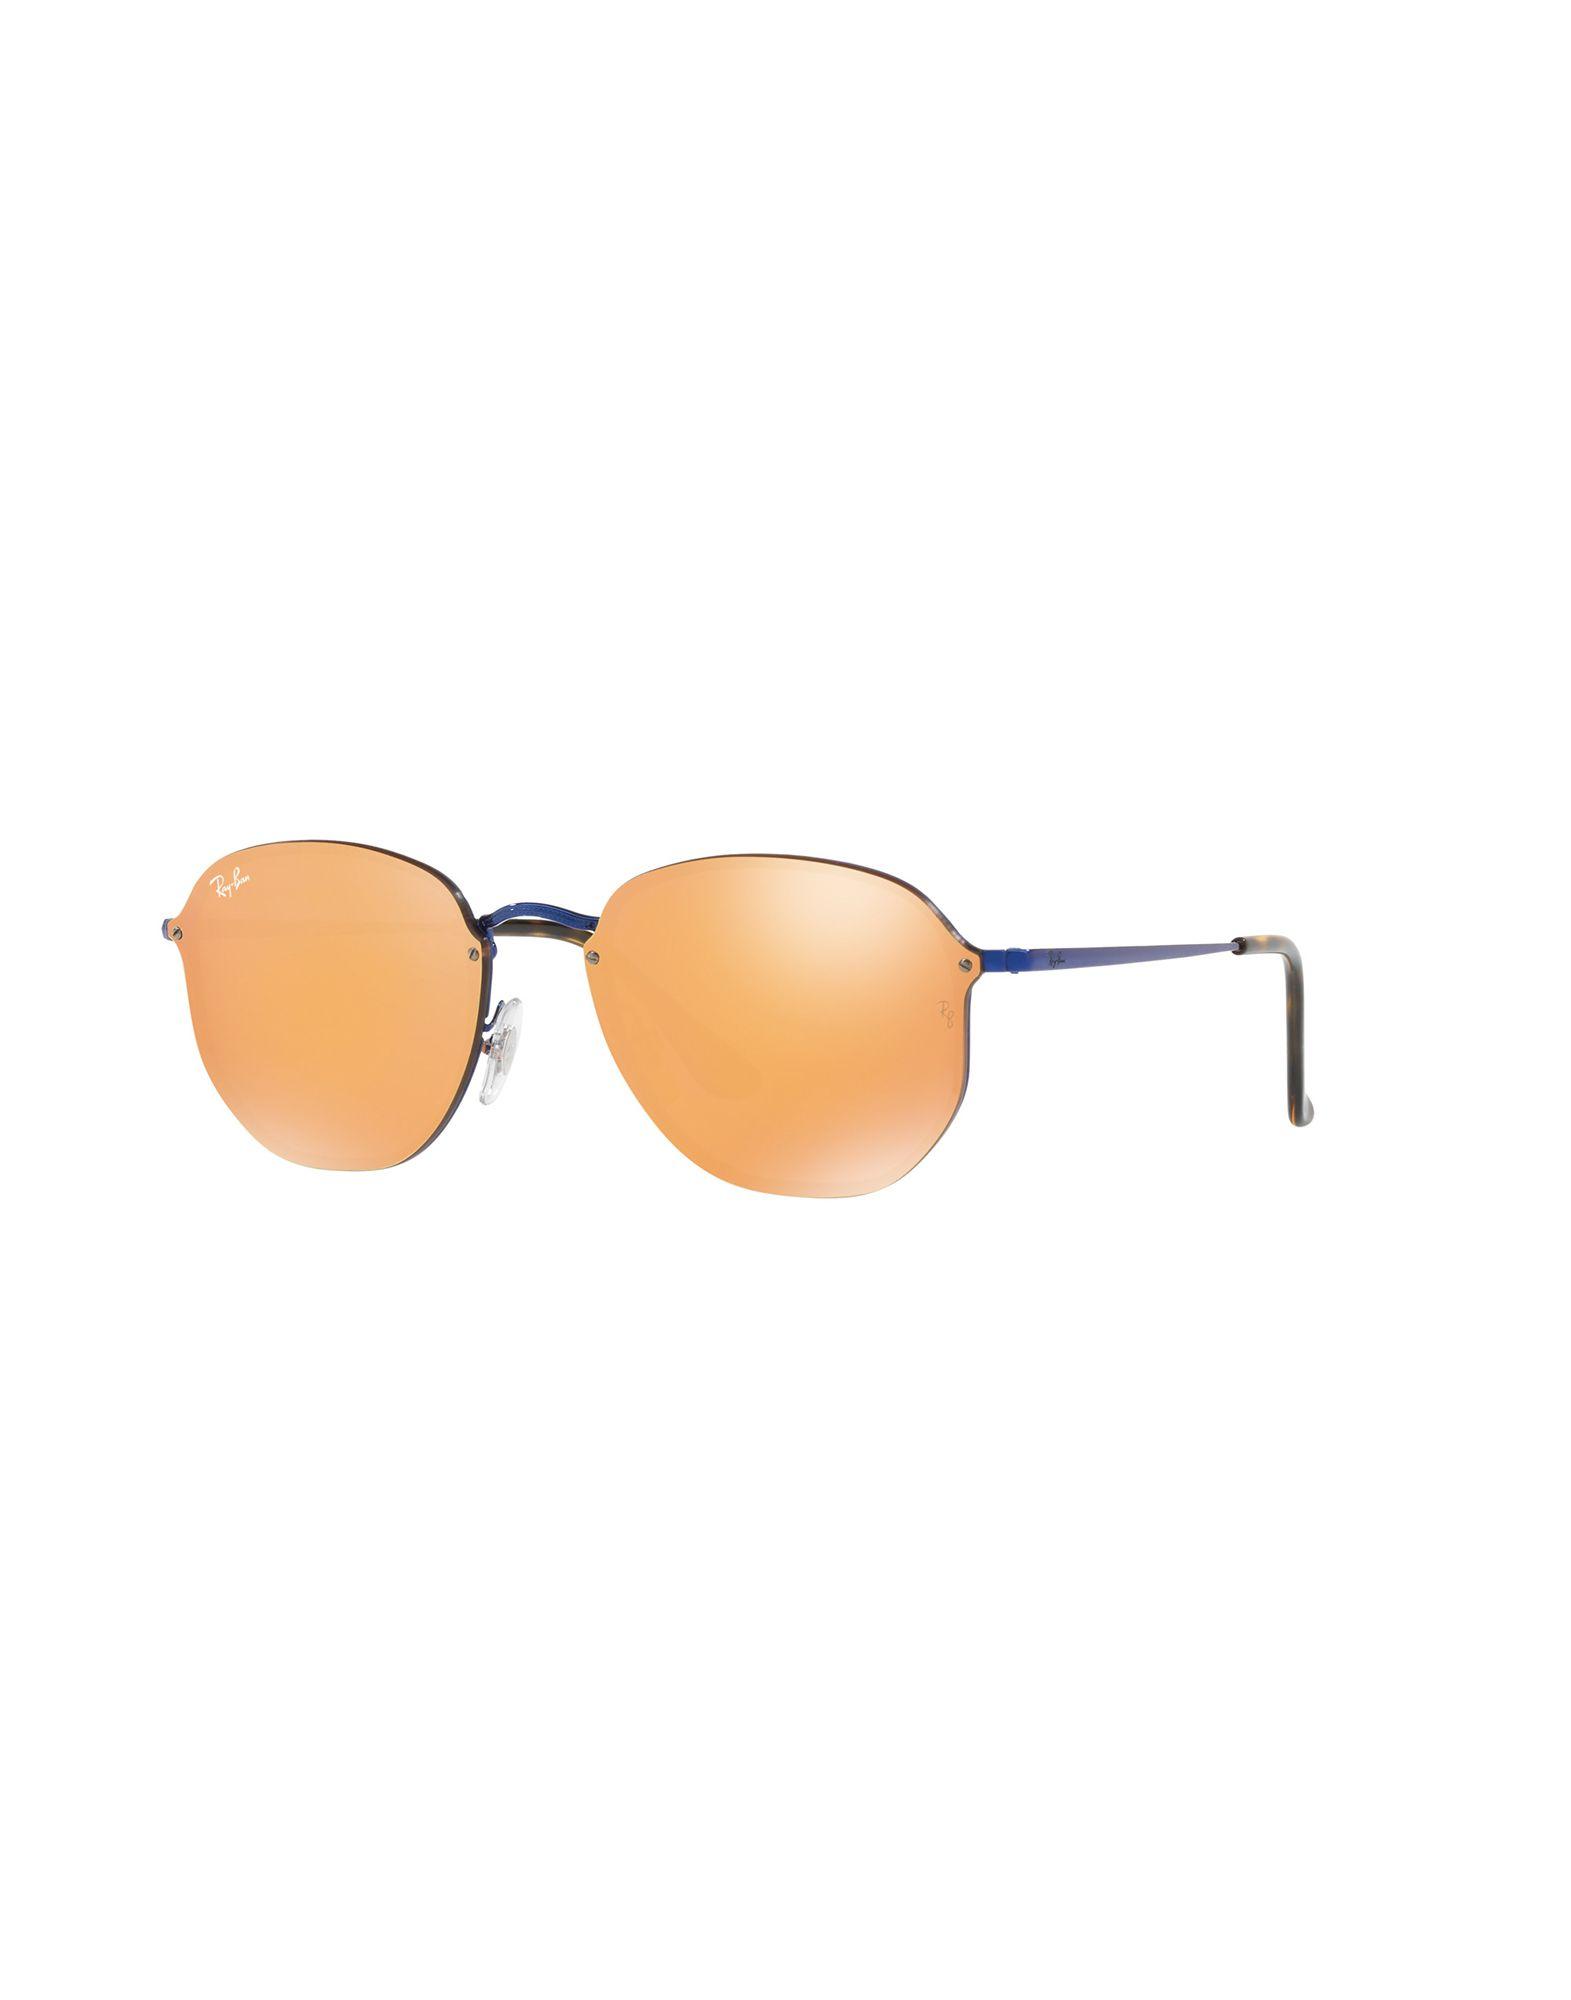 Occhiali Da Sole Ray-Ban Rb3579n Blaze Hexagonal - Uomo - Acquista online su